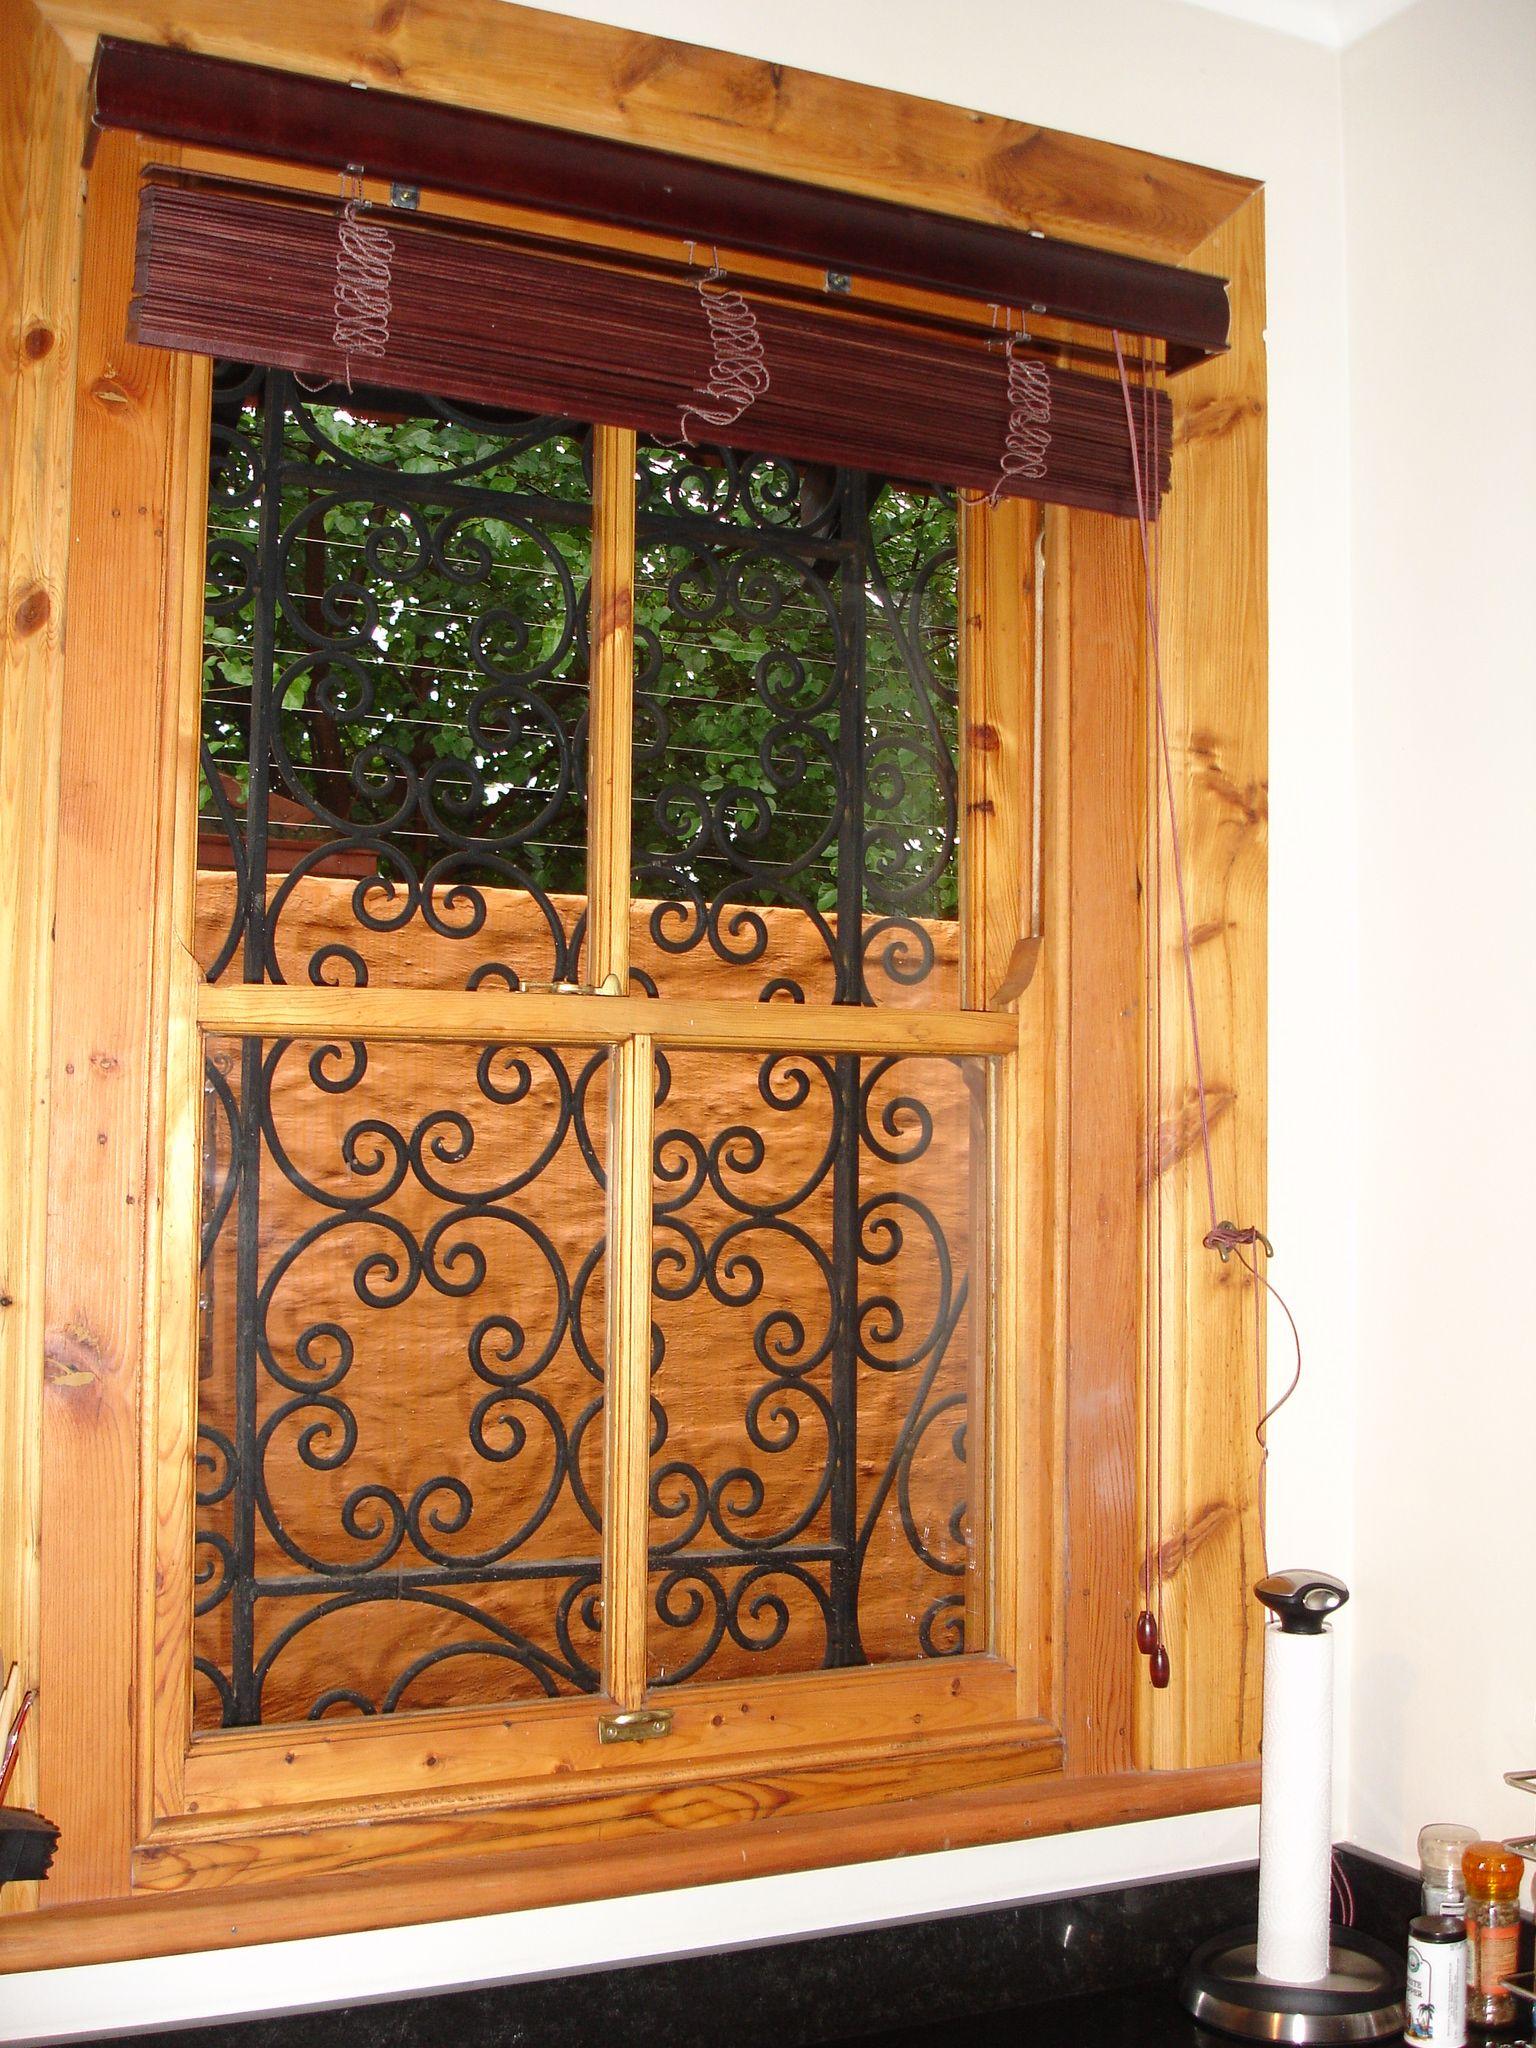 Sash Windows With Re Cycled Farm Gates As Burglar Bars